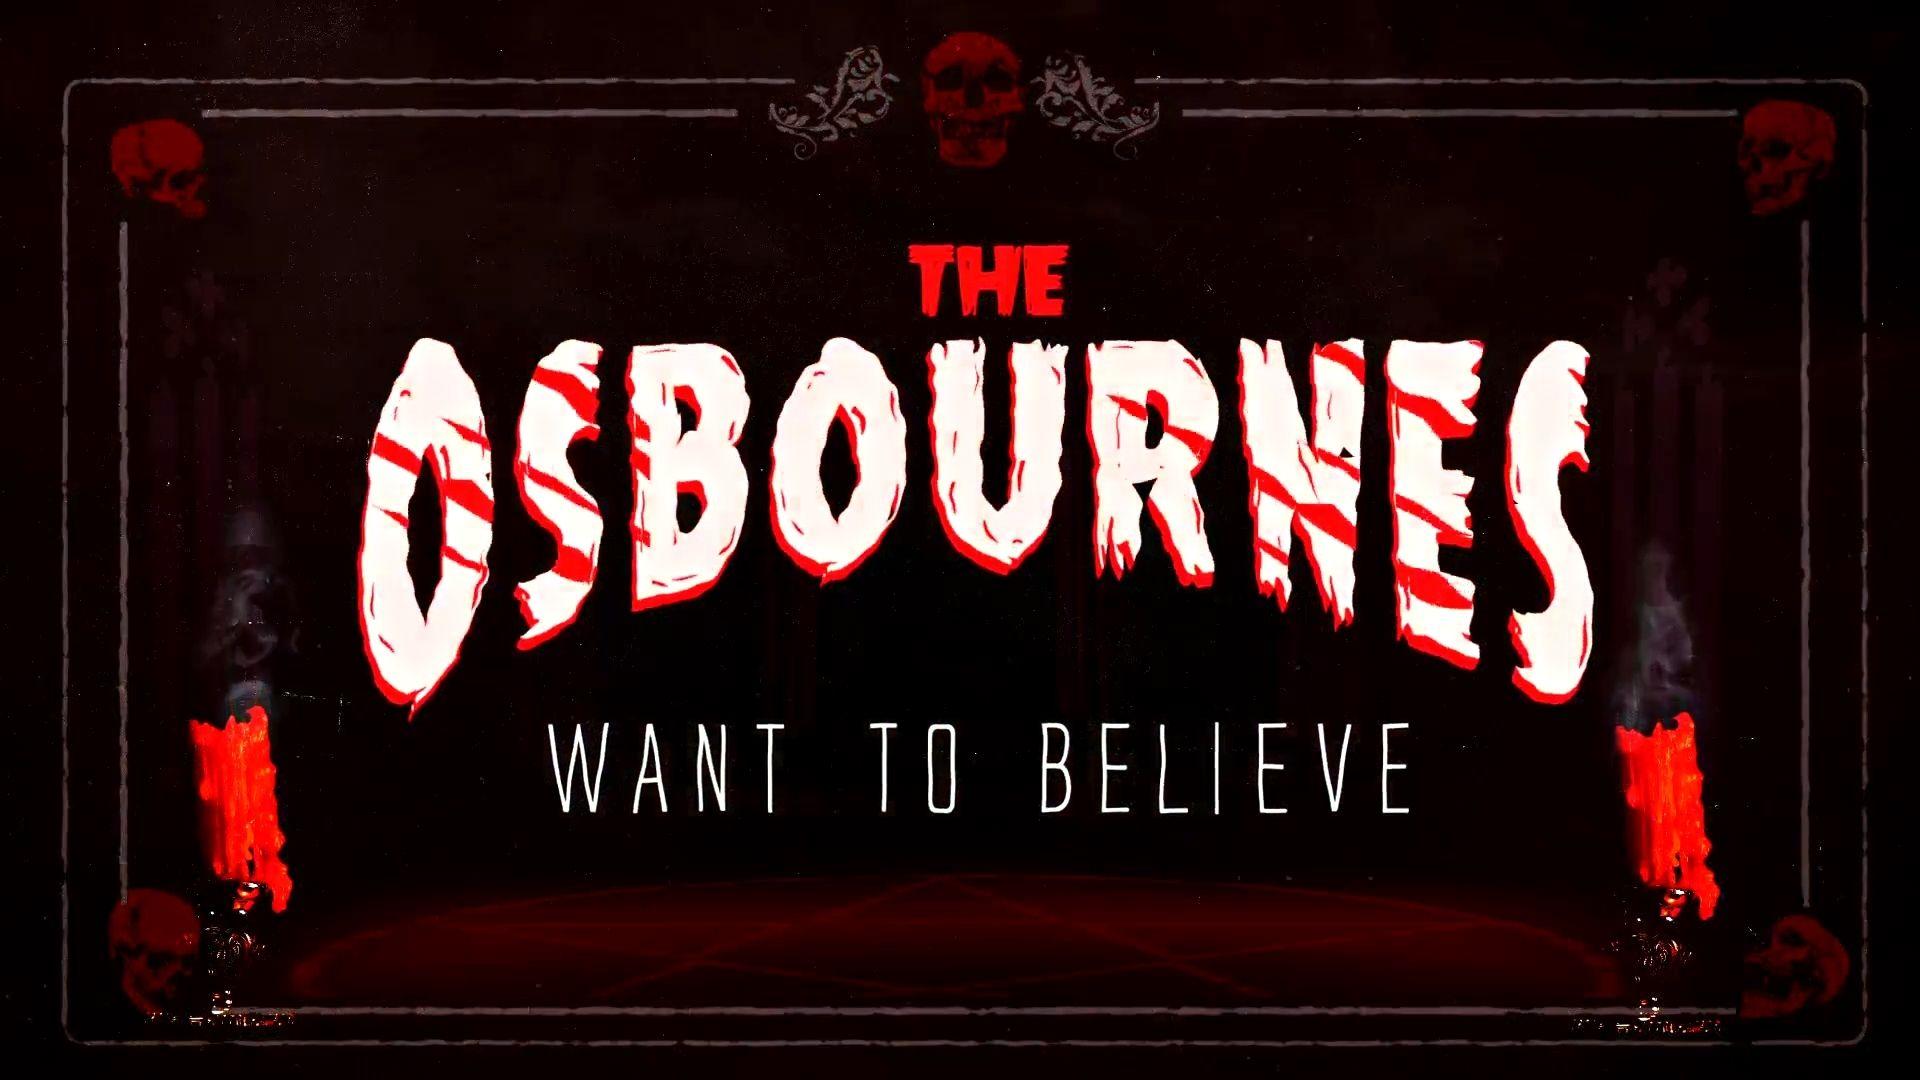 The Osbournes Want To Believe Season 2 Episode 8